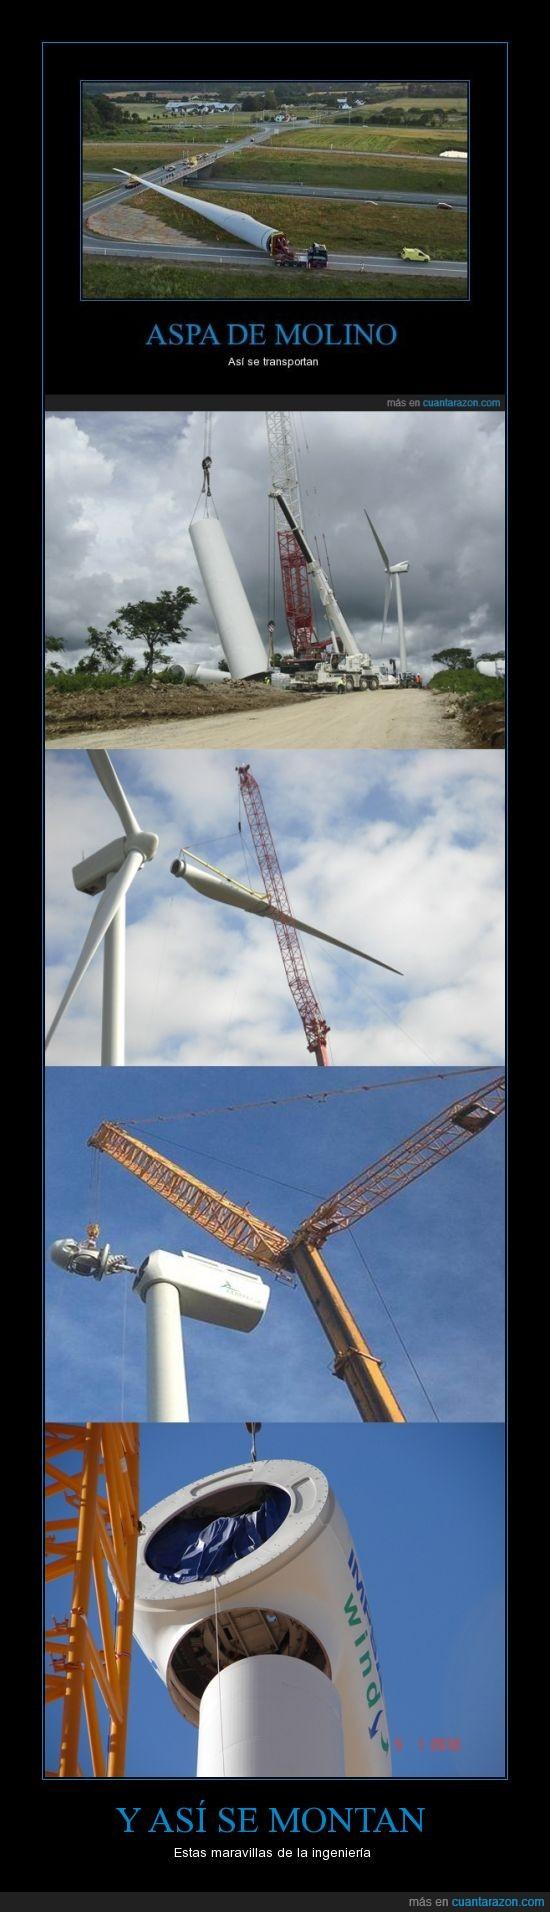 aspa,ingeniería,molino,montaje,montar,viento